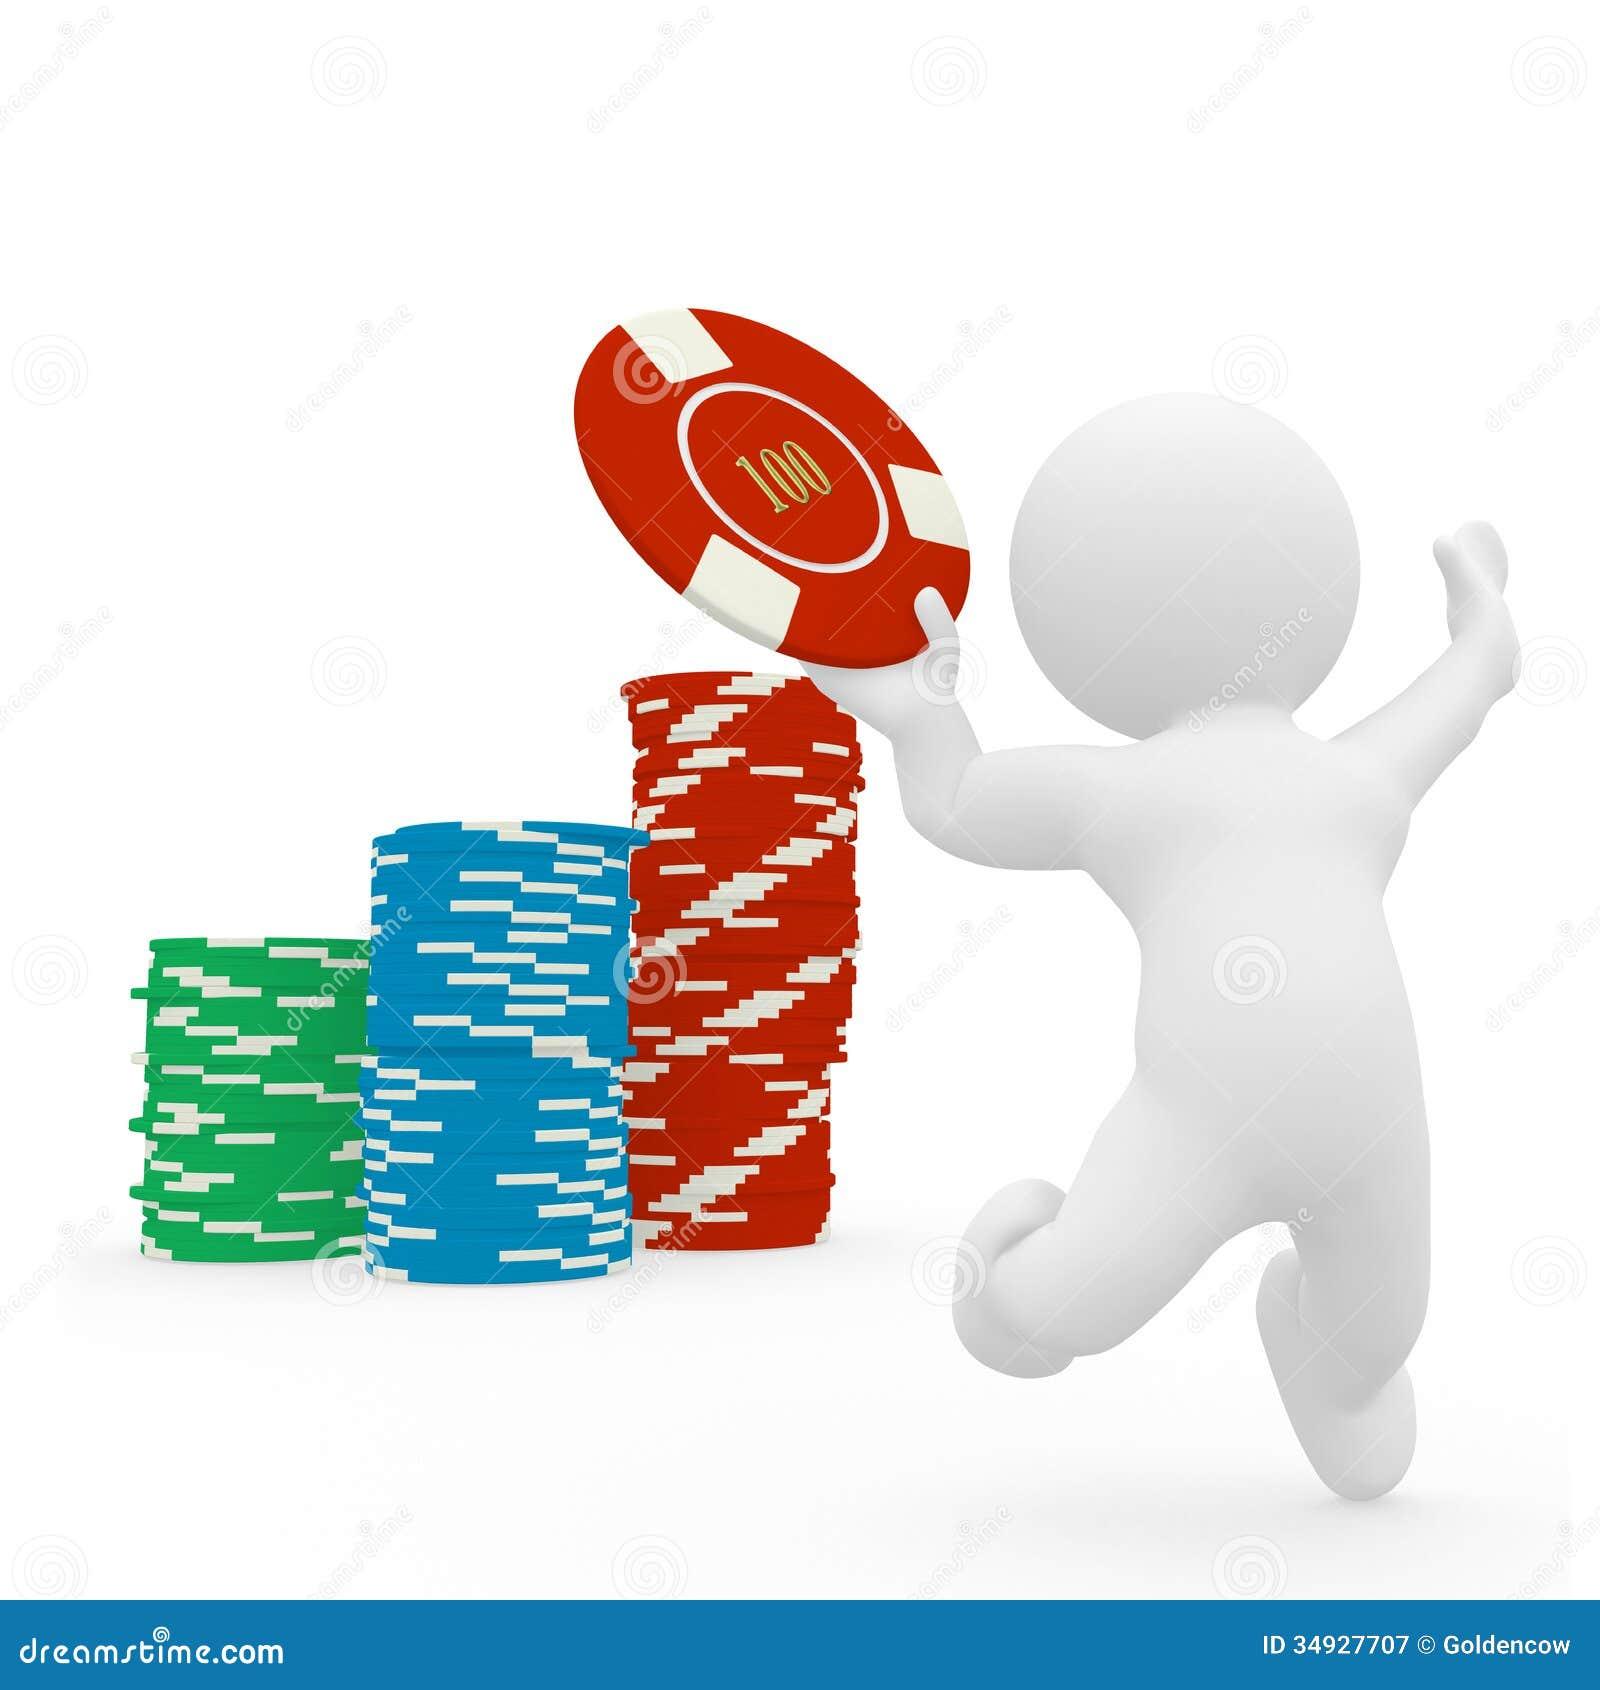 Mr. Smart Guy wins the poker match